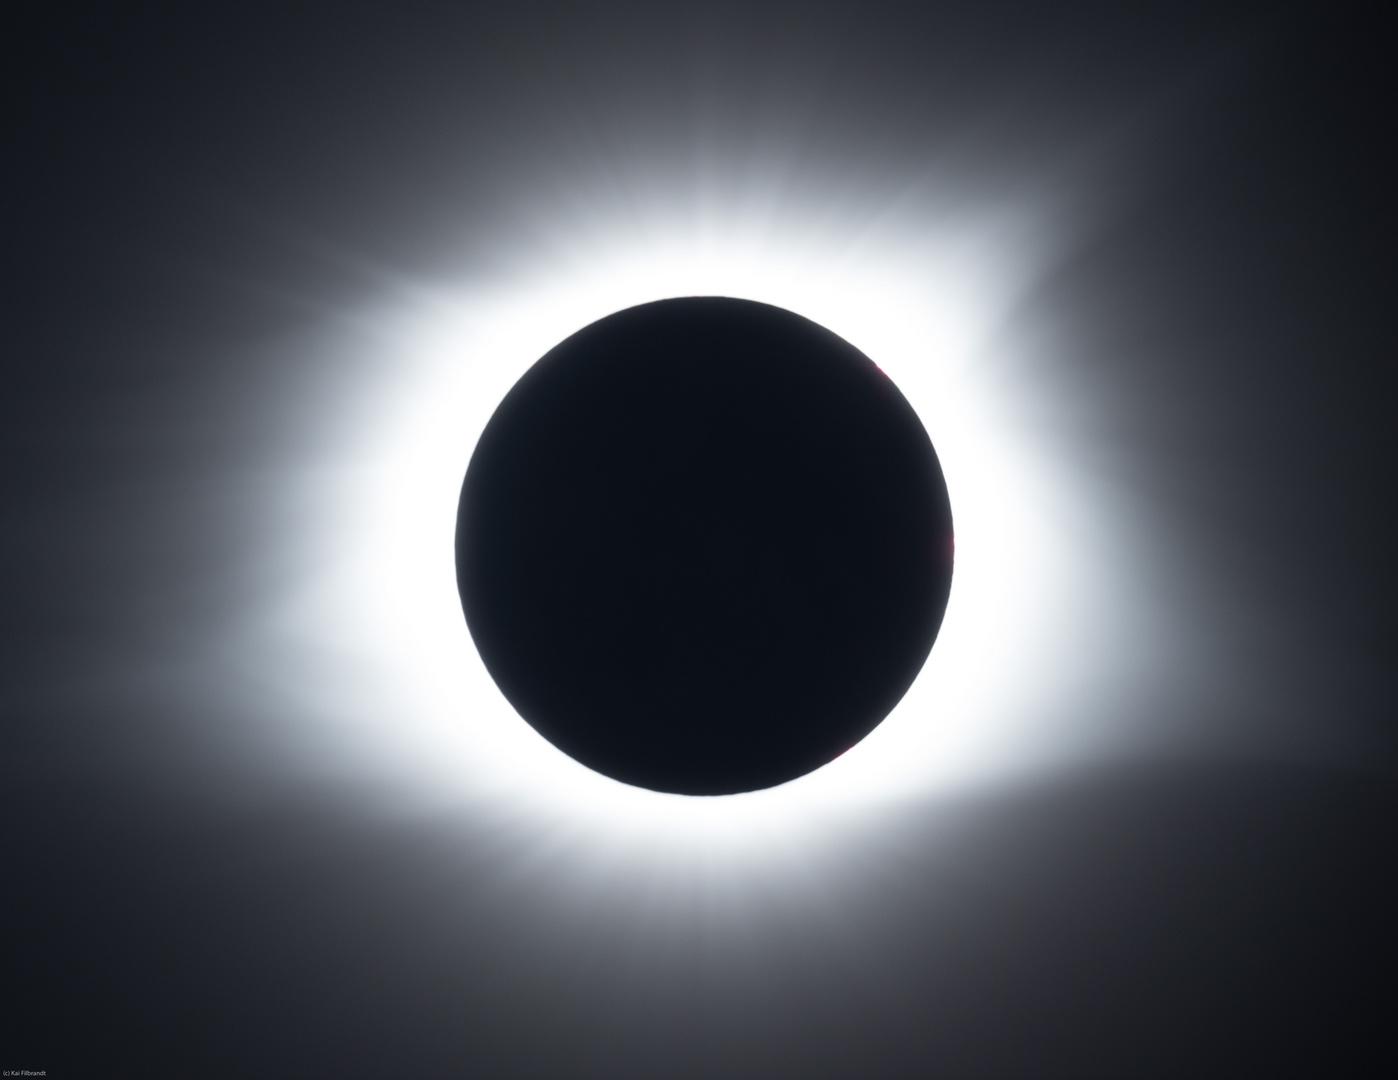 Totale Sonnenfinsternis 2017